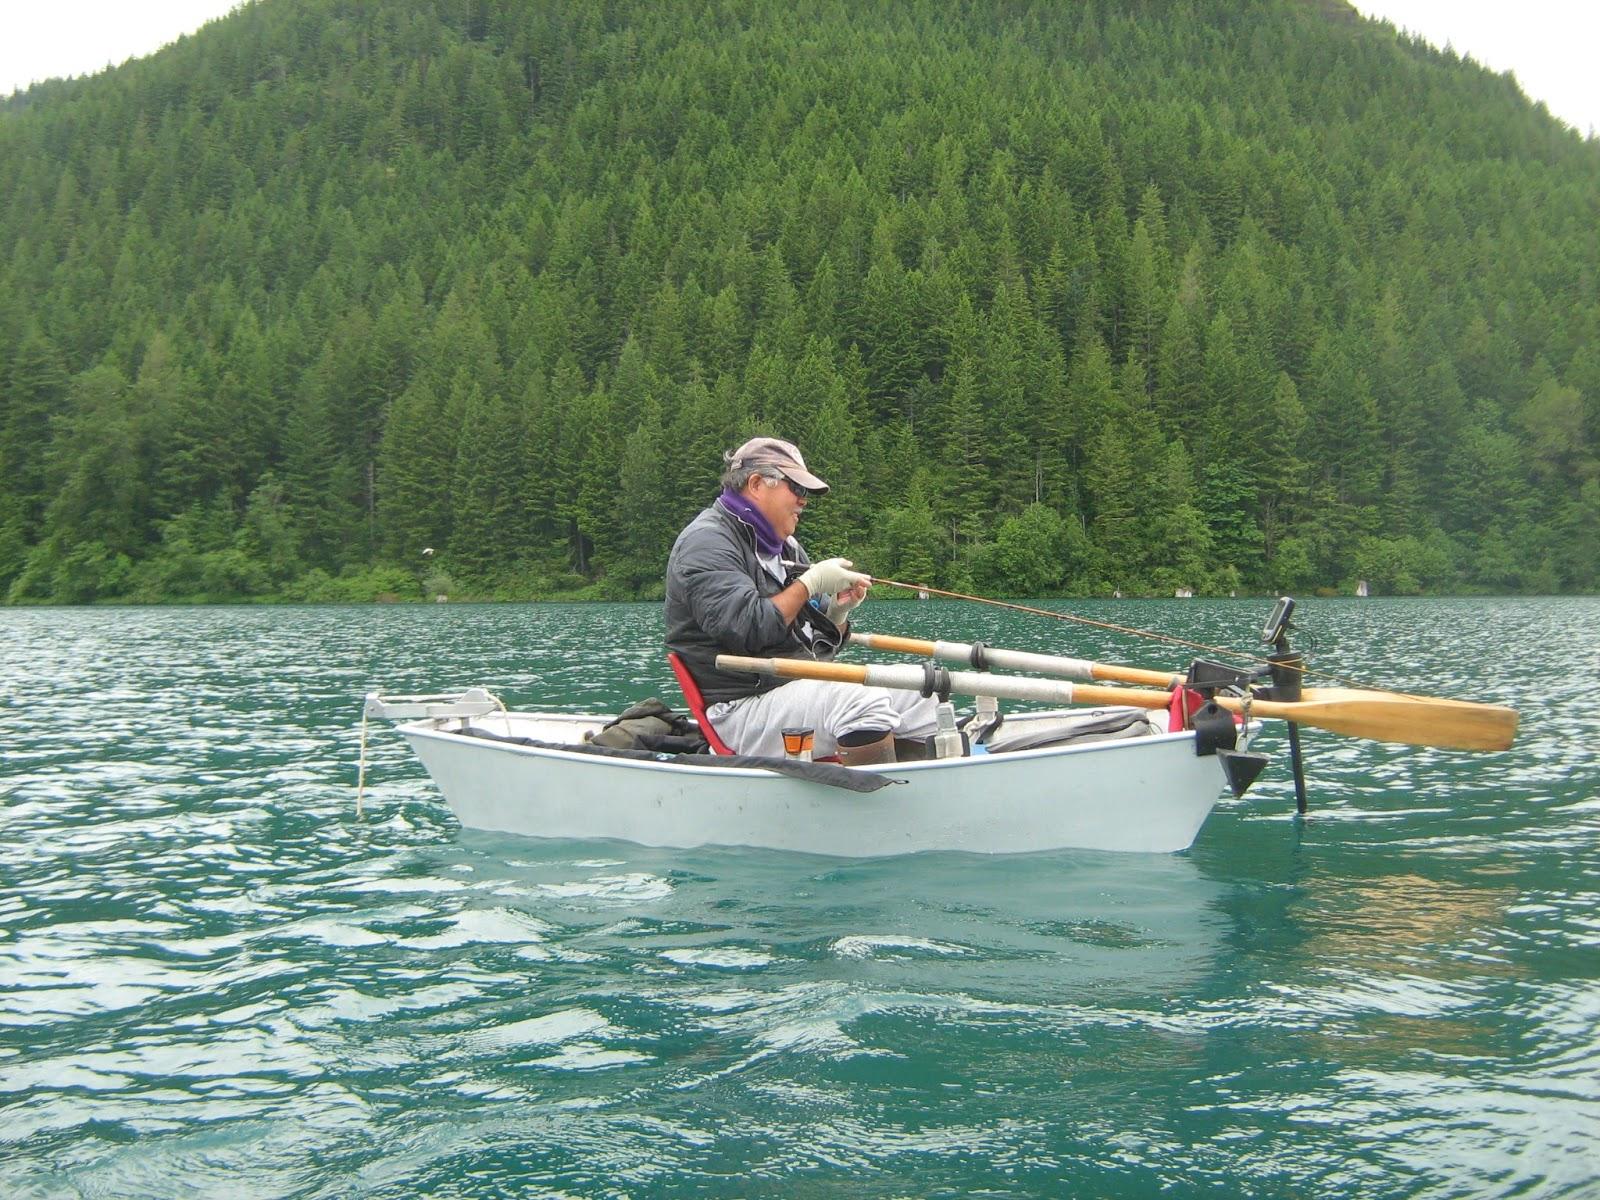 Breaking rods june 2013 for Fly fishing classes near me